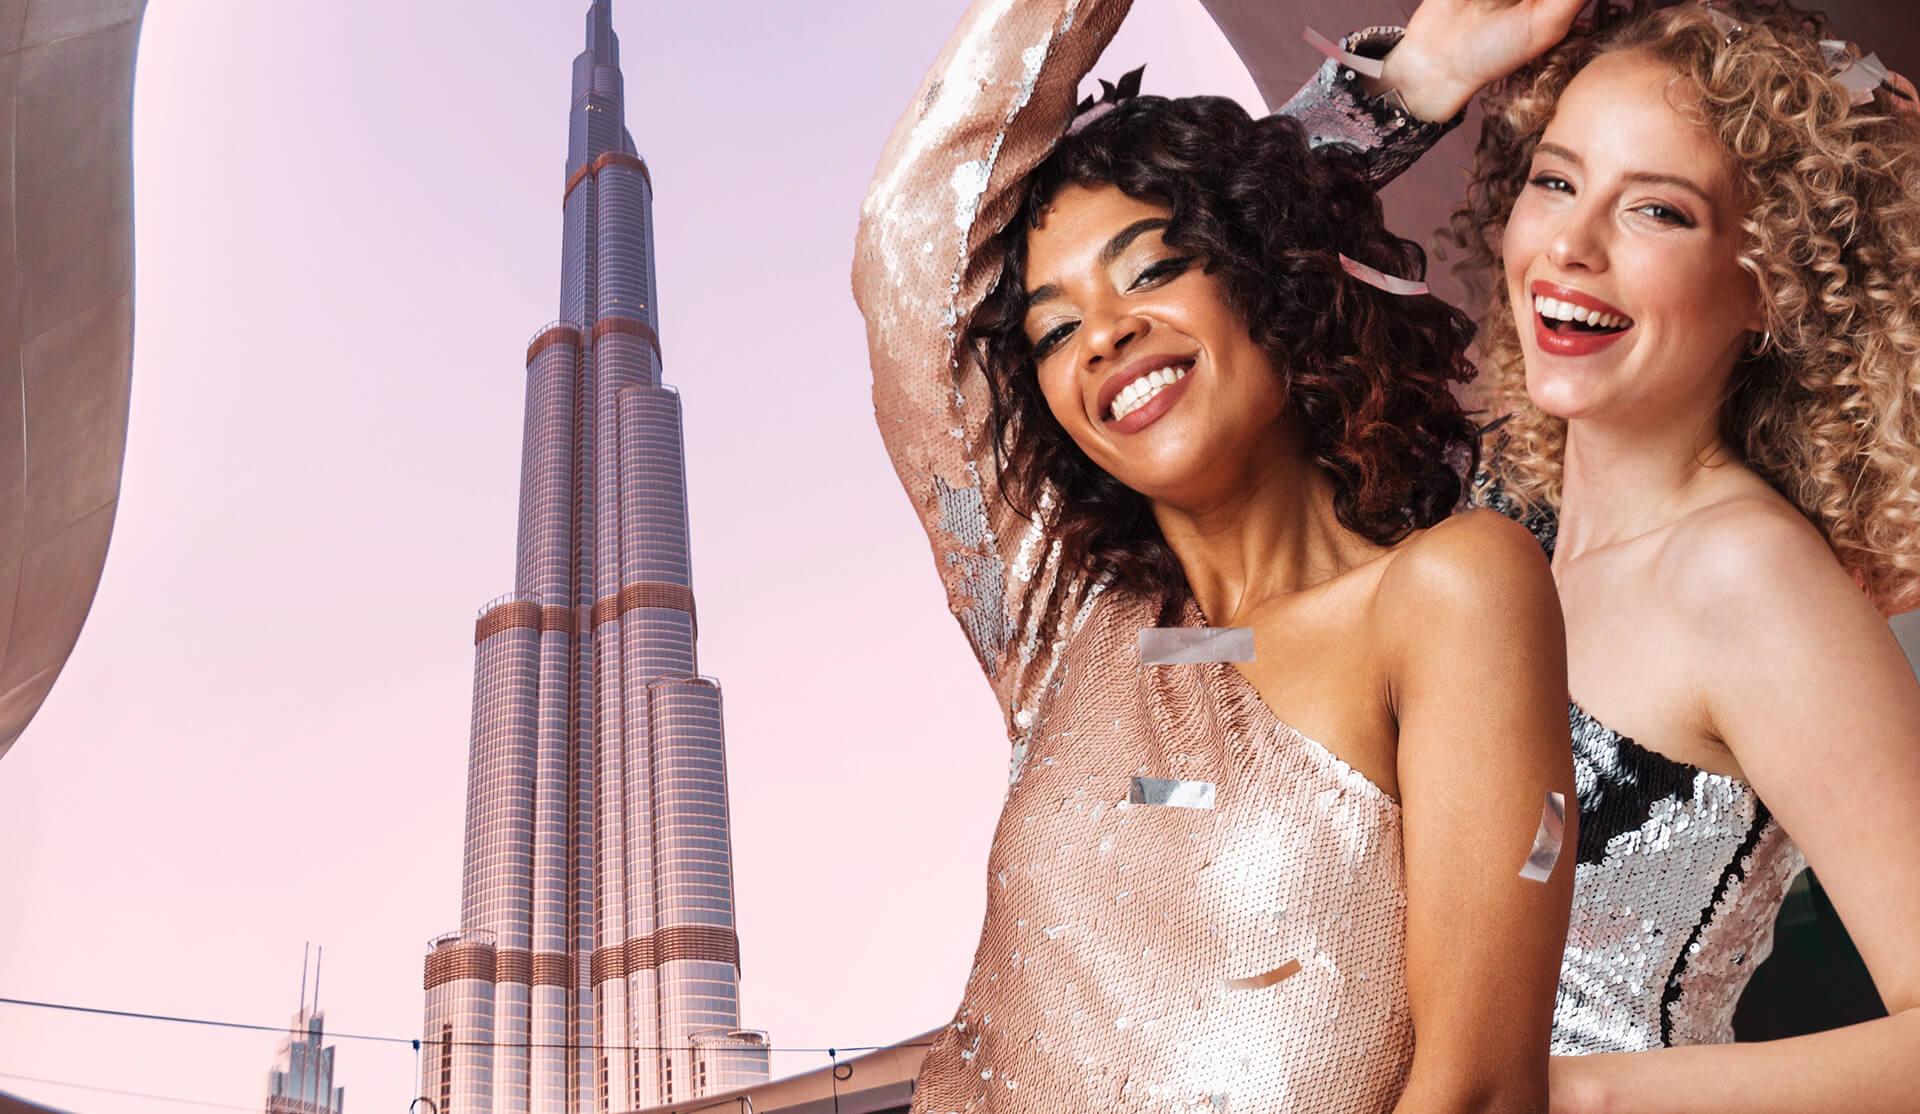 Rooftop Party Brunch - The Loft at Dubai Opera